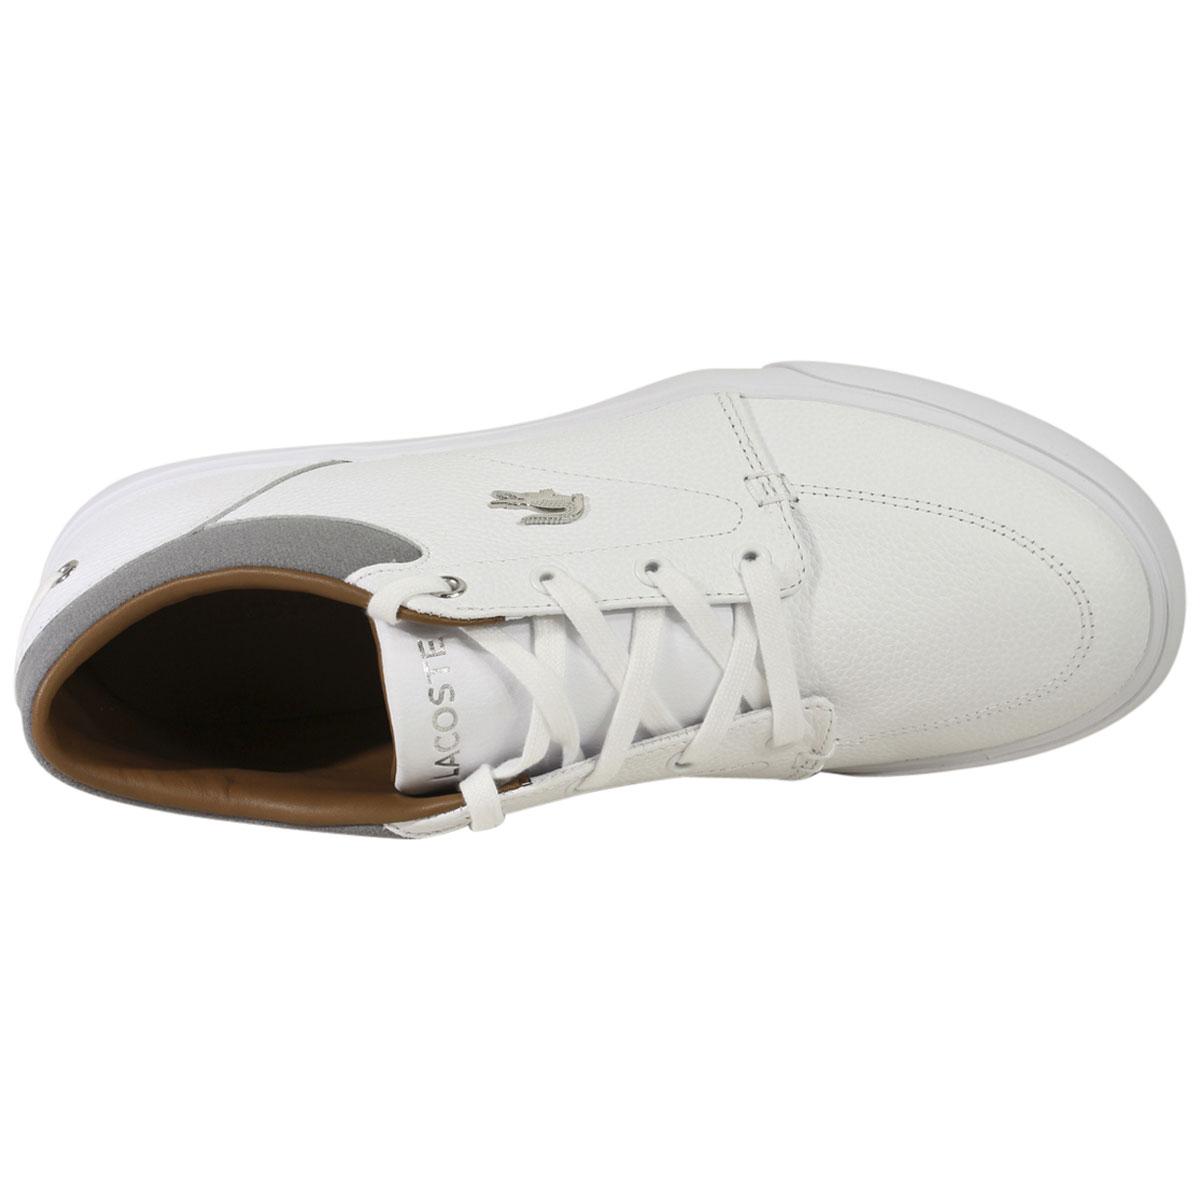 Lacoste-Men-039-s-Bayliss-118-Sneakers-Shoes thumbnail 20